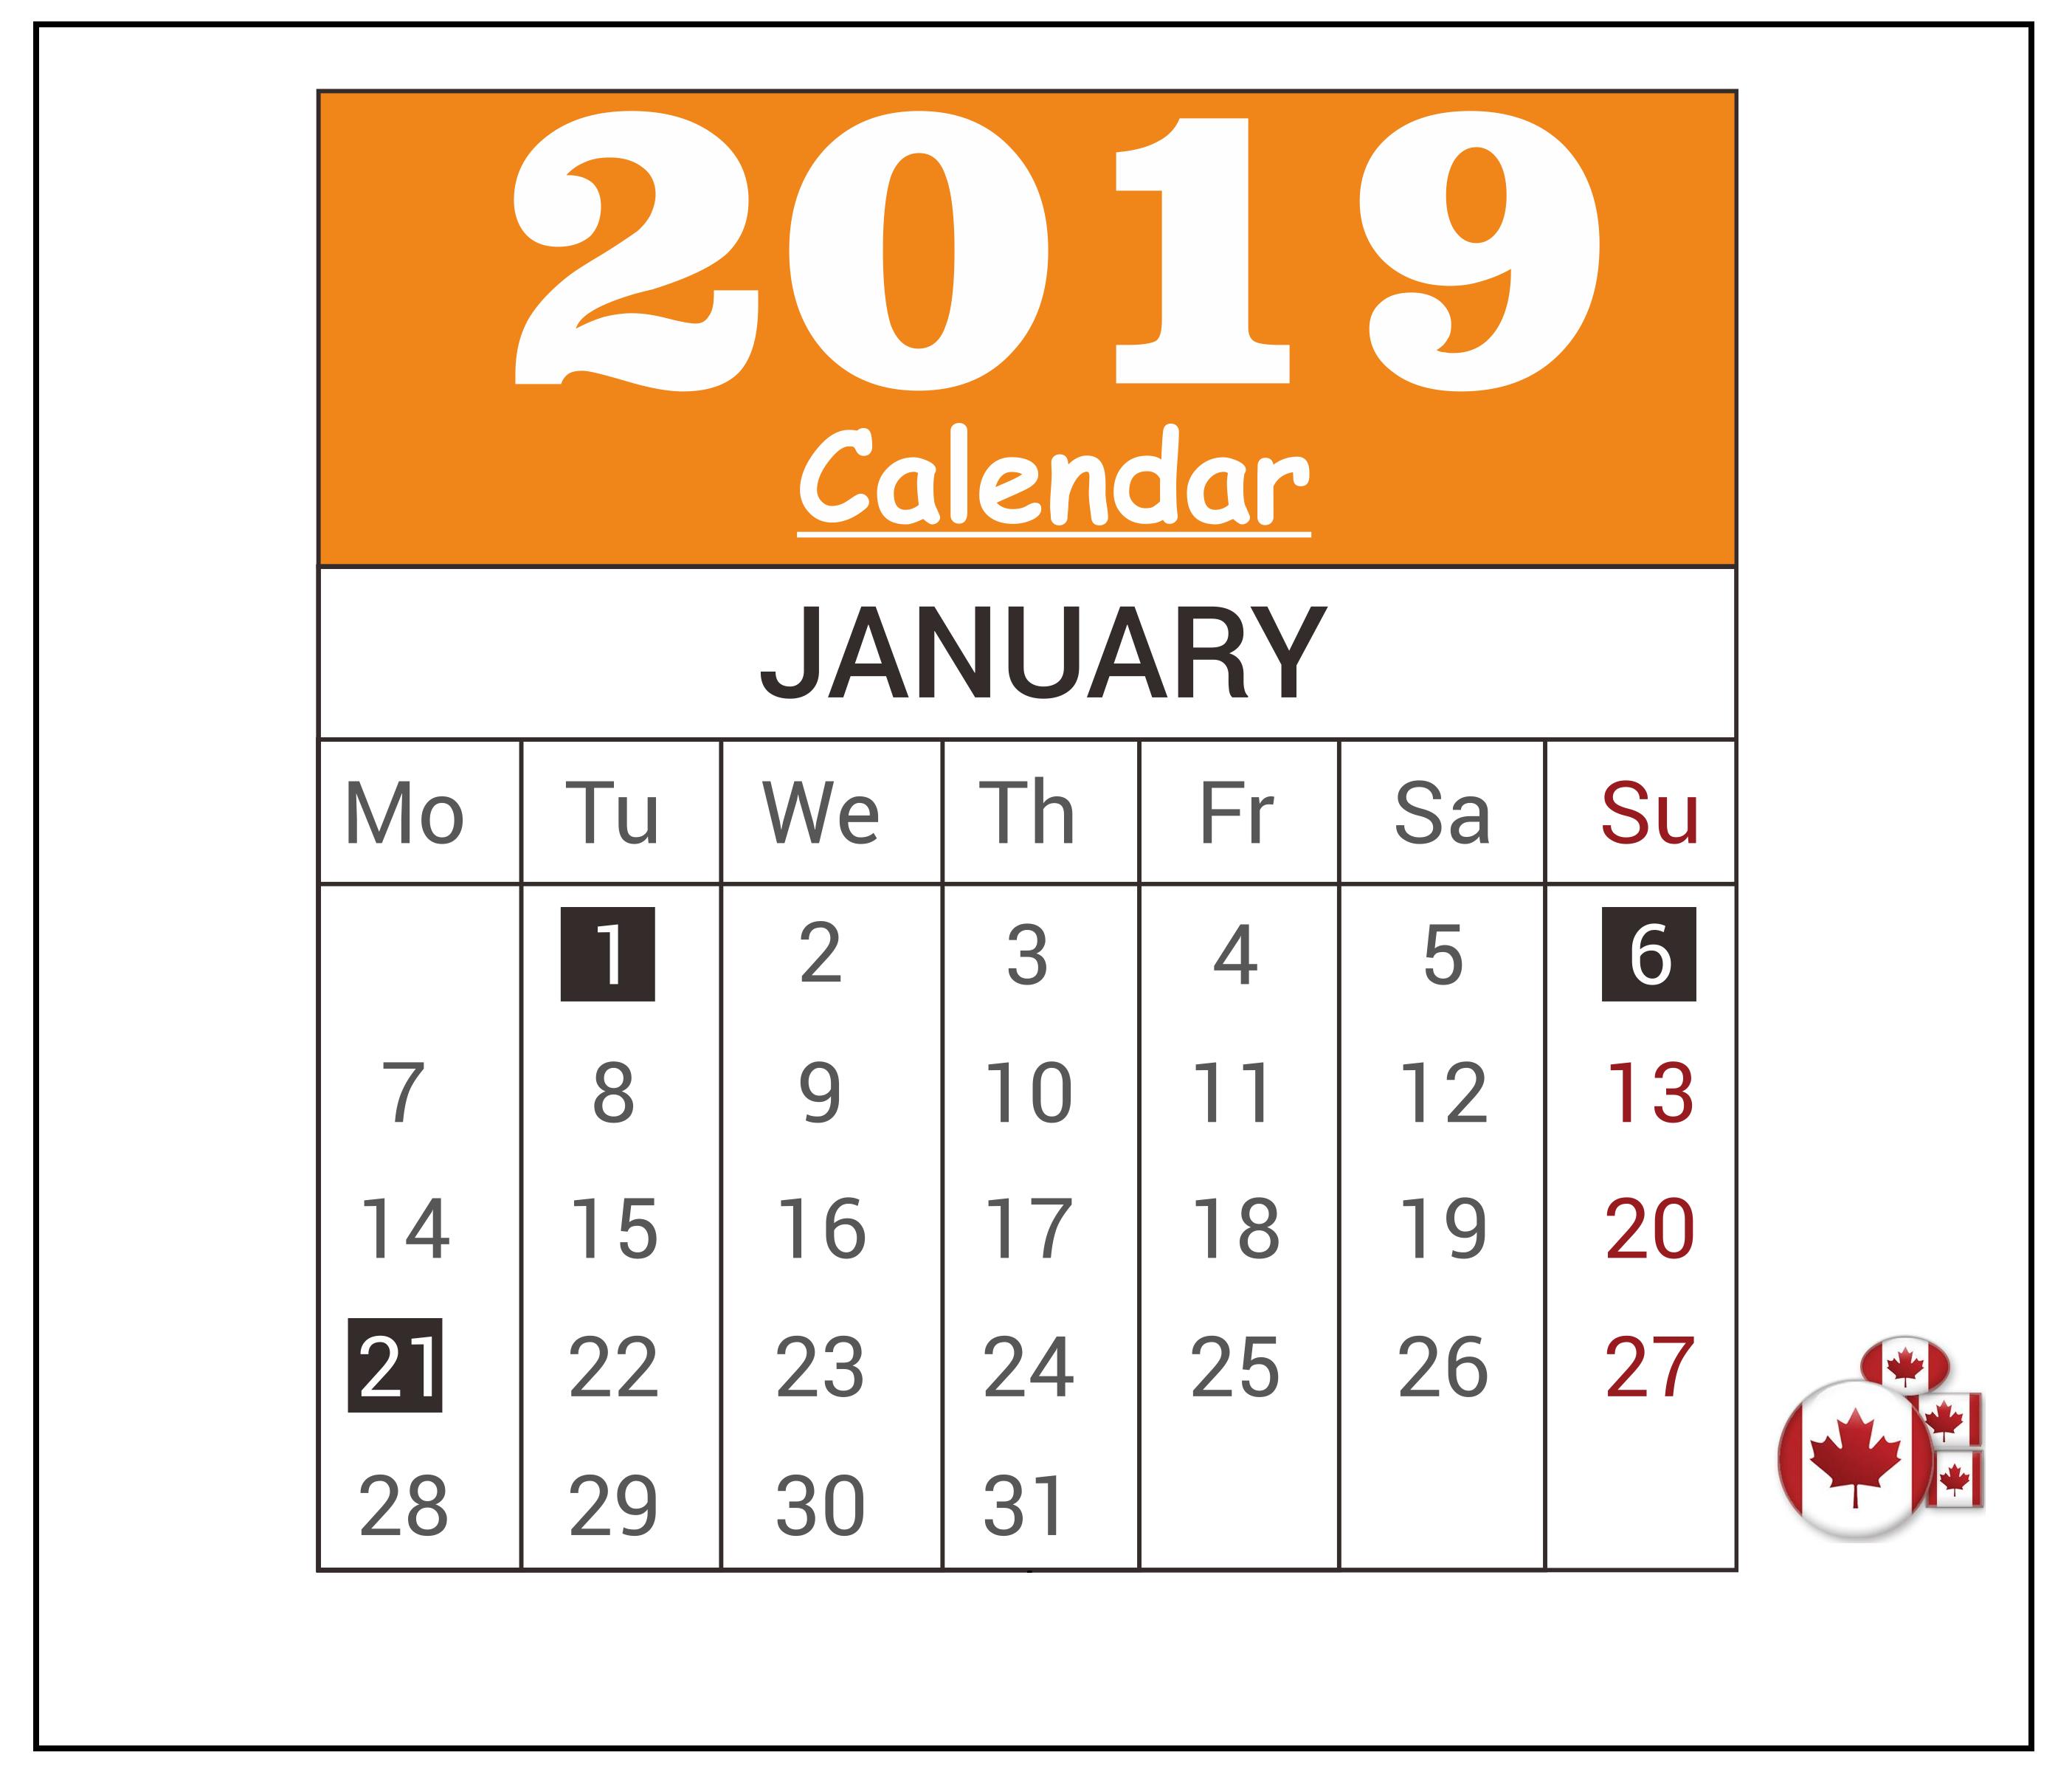 January 2019 Federal Holiday Canada Calendar